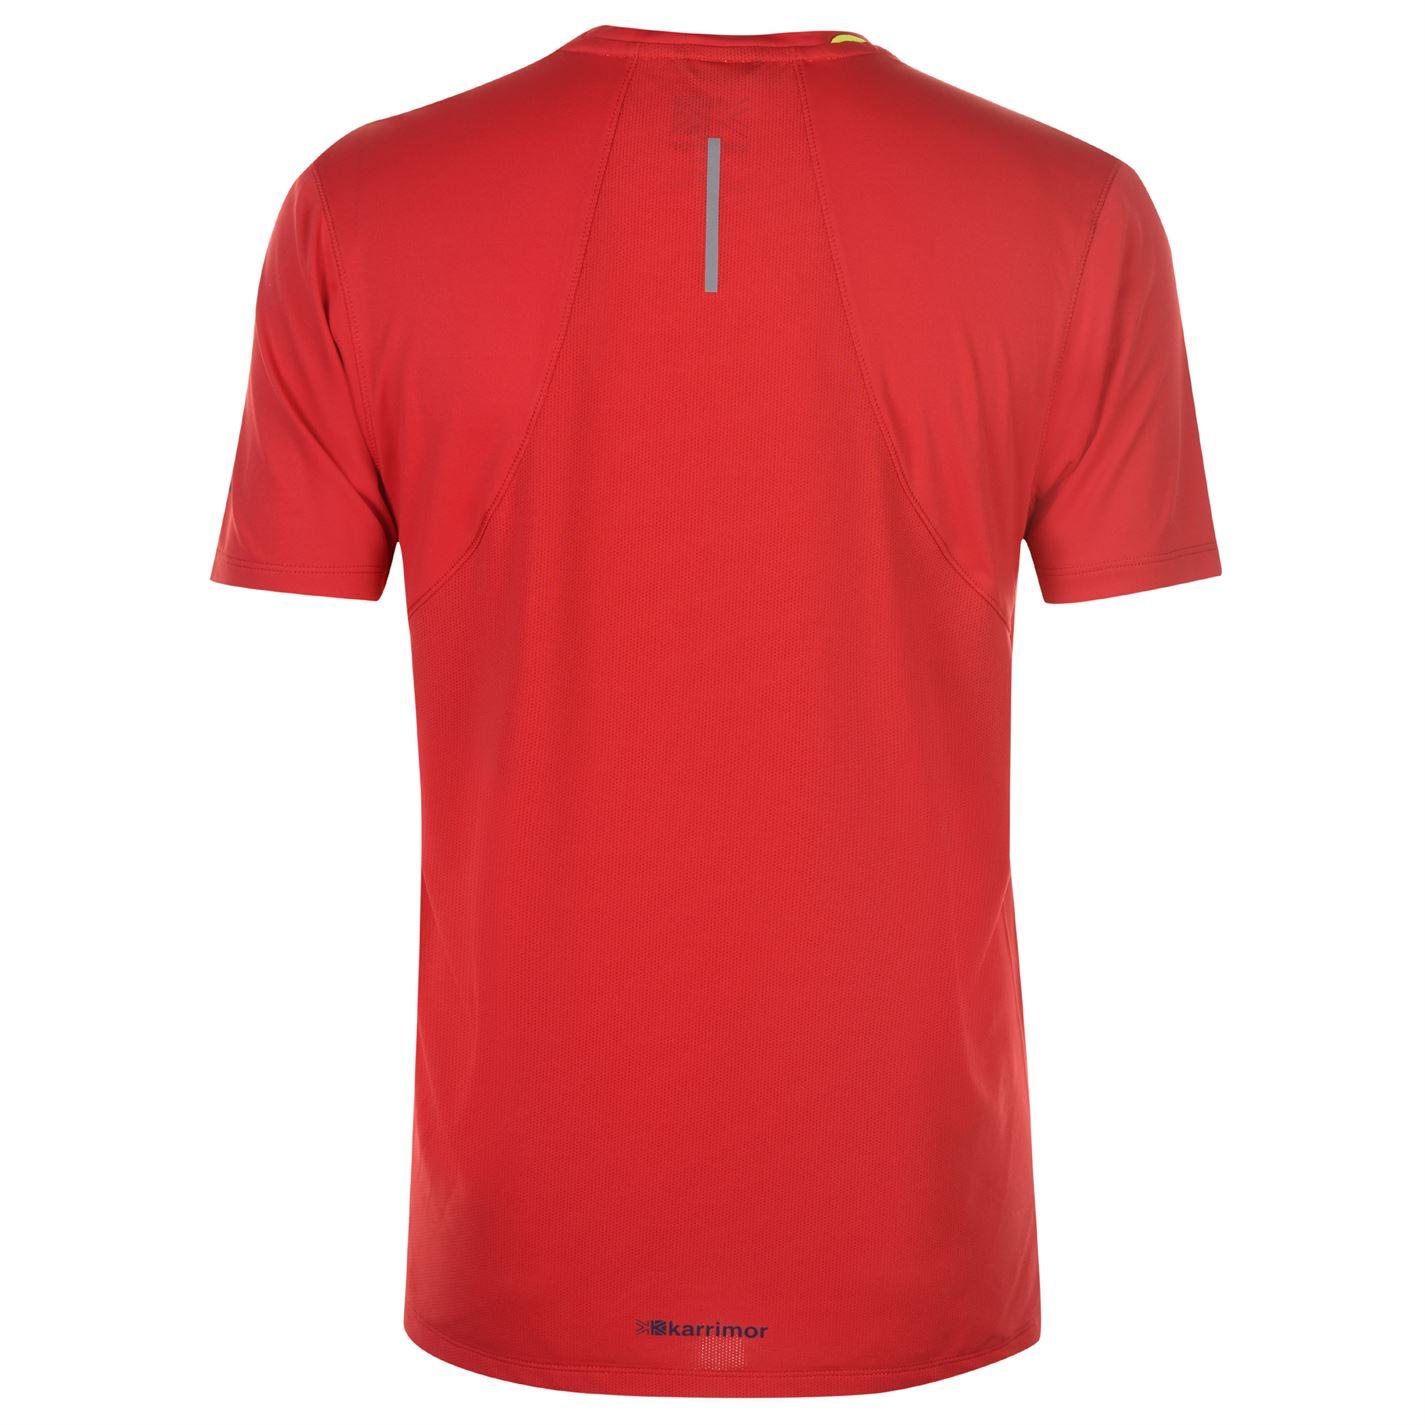 Karrimor-Hombres-X-Lite-Camiseta-mangas-cortas-de-carrera-Rendimiento-Camiseta-Top-Cuello-Redondo miniatura 28